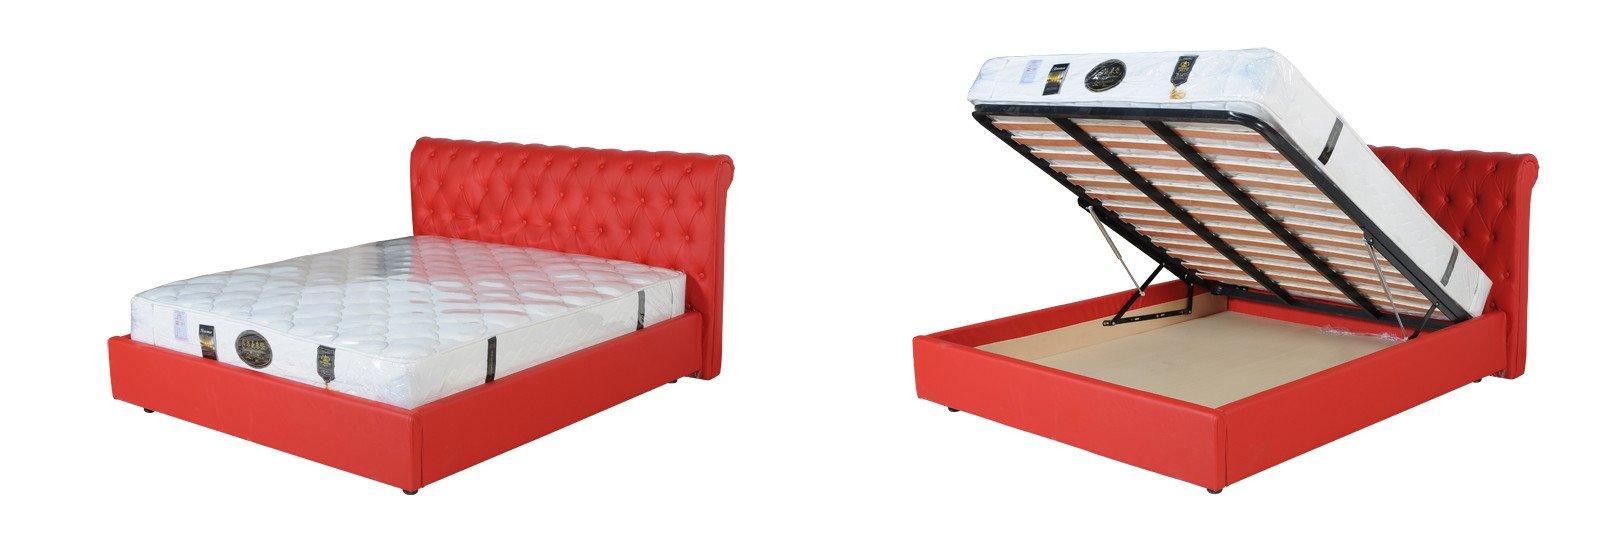 Xianghe Jinye Steel-Wood Furniture Co., Ltd. - Sofa,Metal Bed